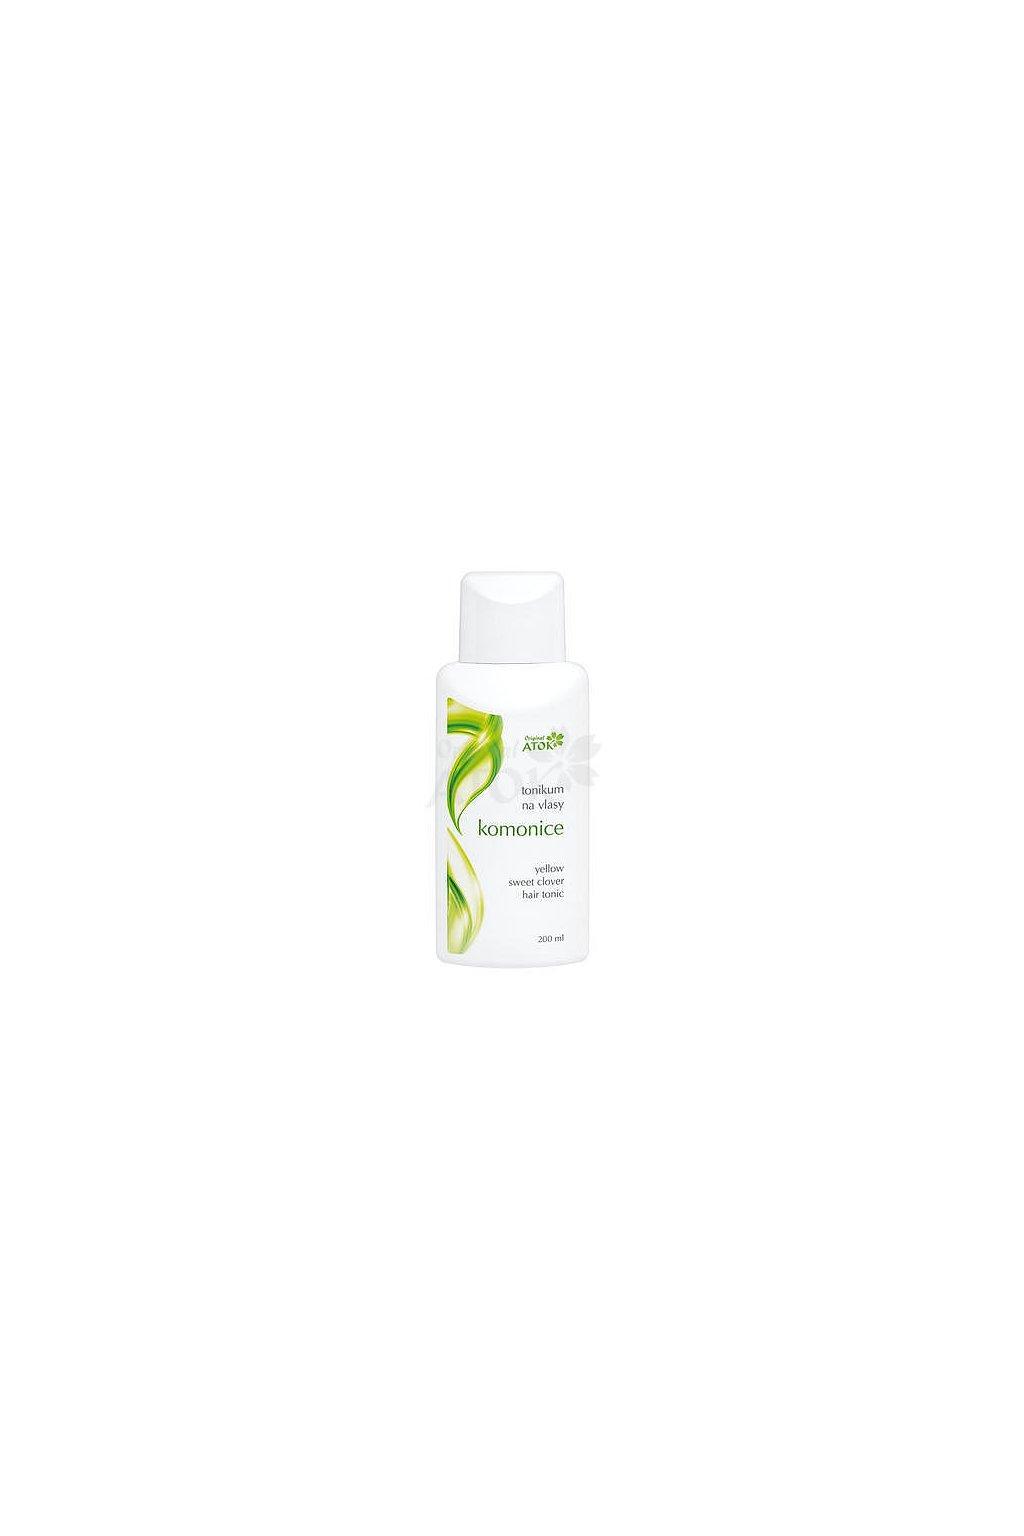 Atok Vlasové tonikum komonicové 100 ml